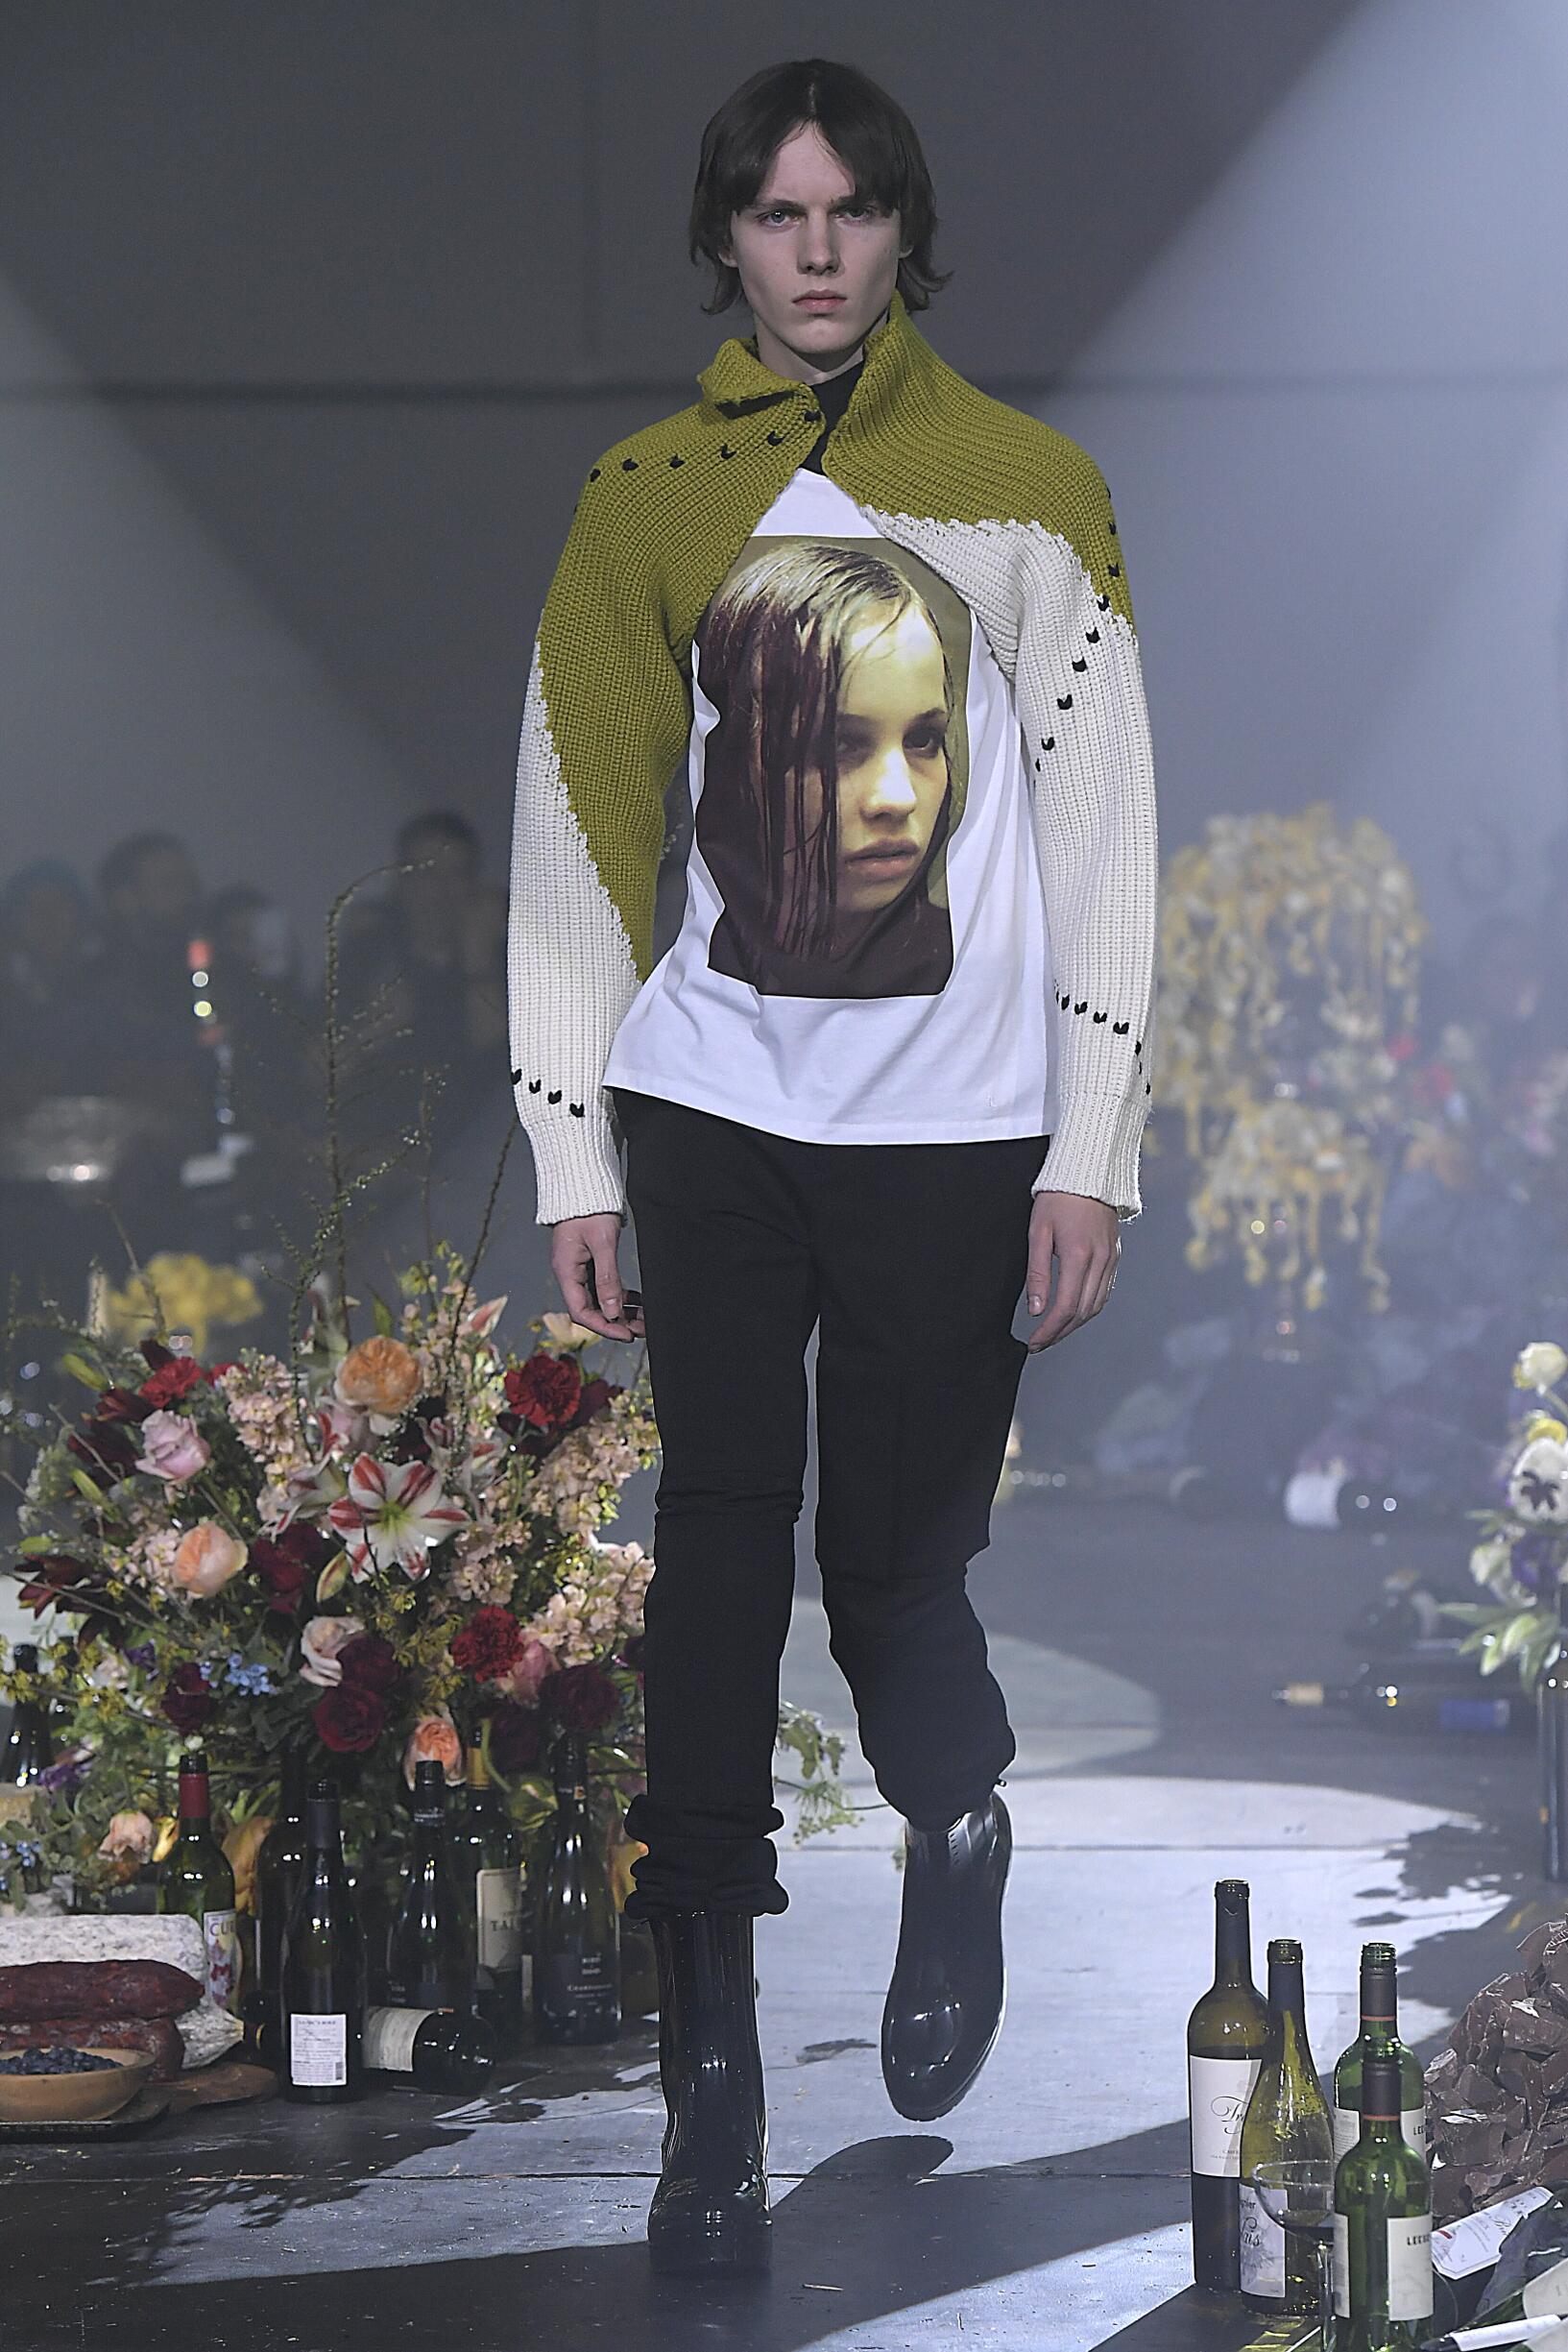 Catwalk Raf Simons Man Fashion Show Winter 2018